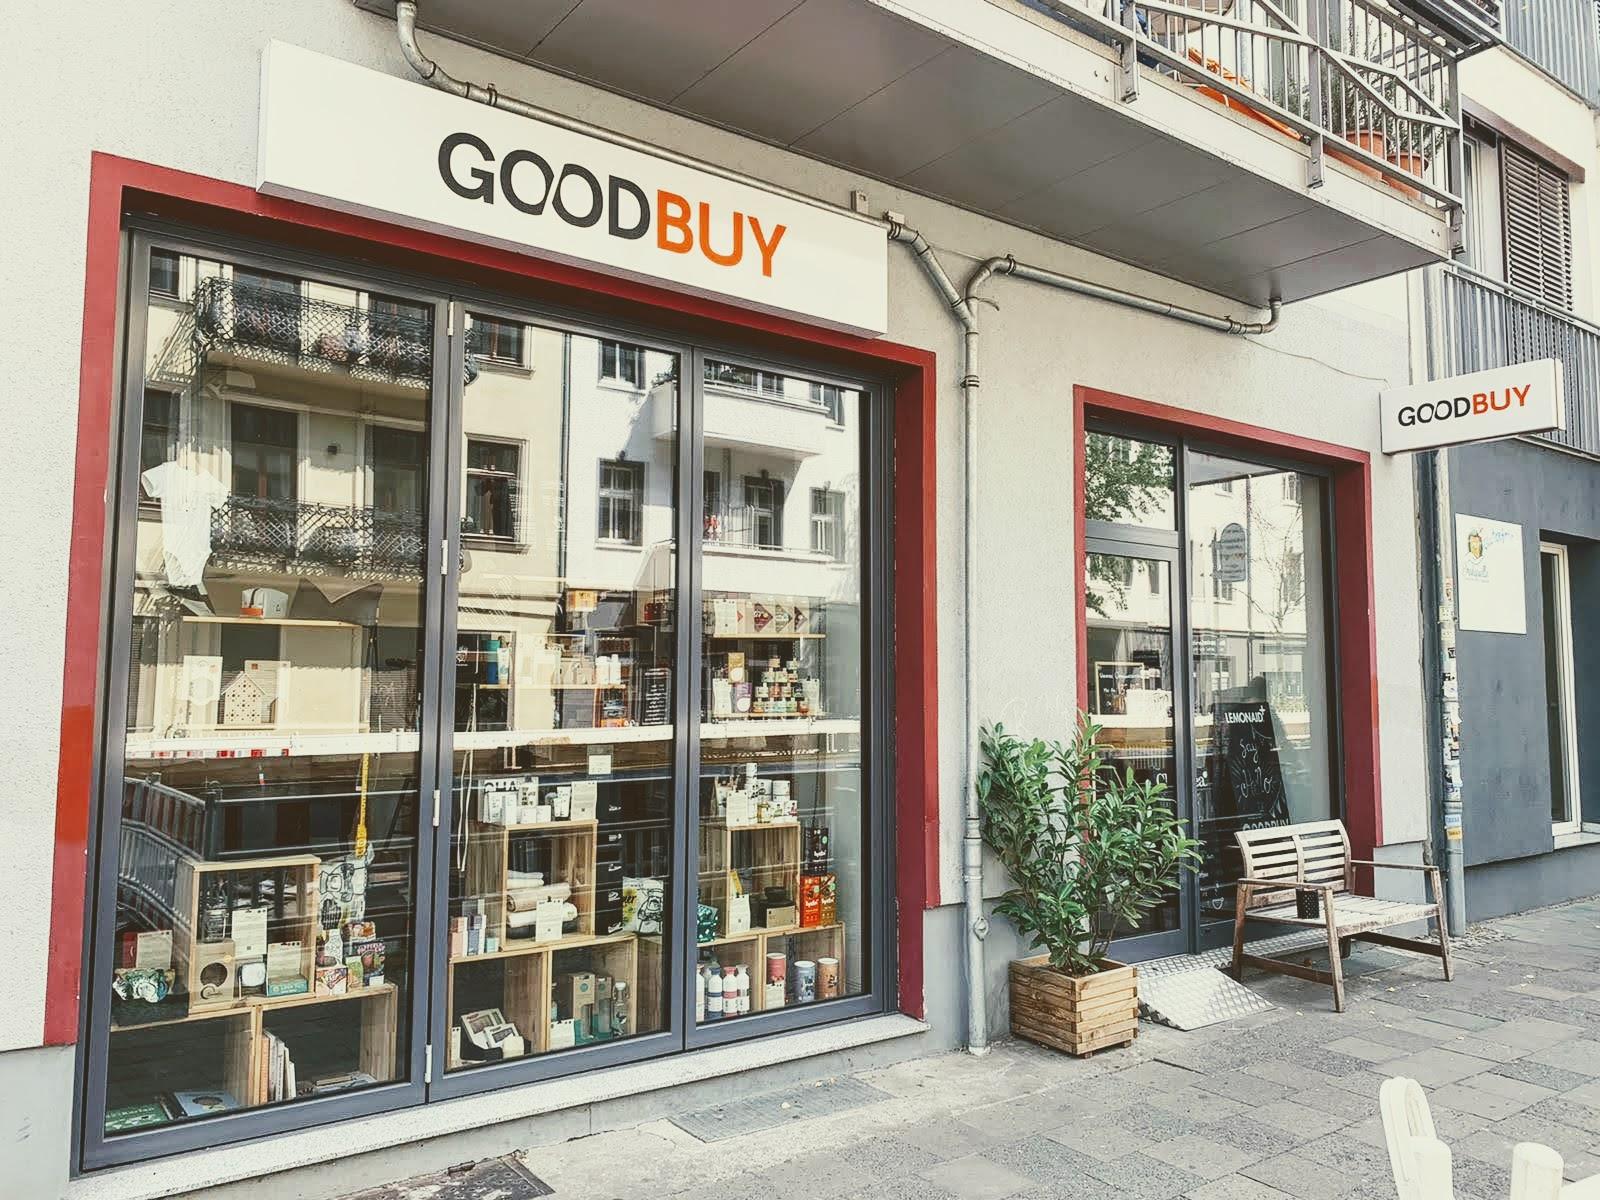 Goodbuy Store